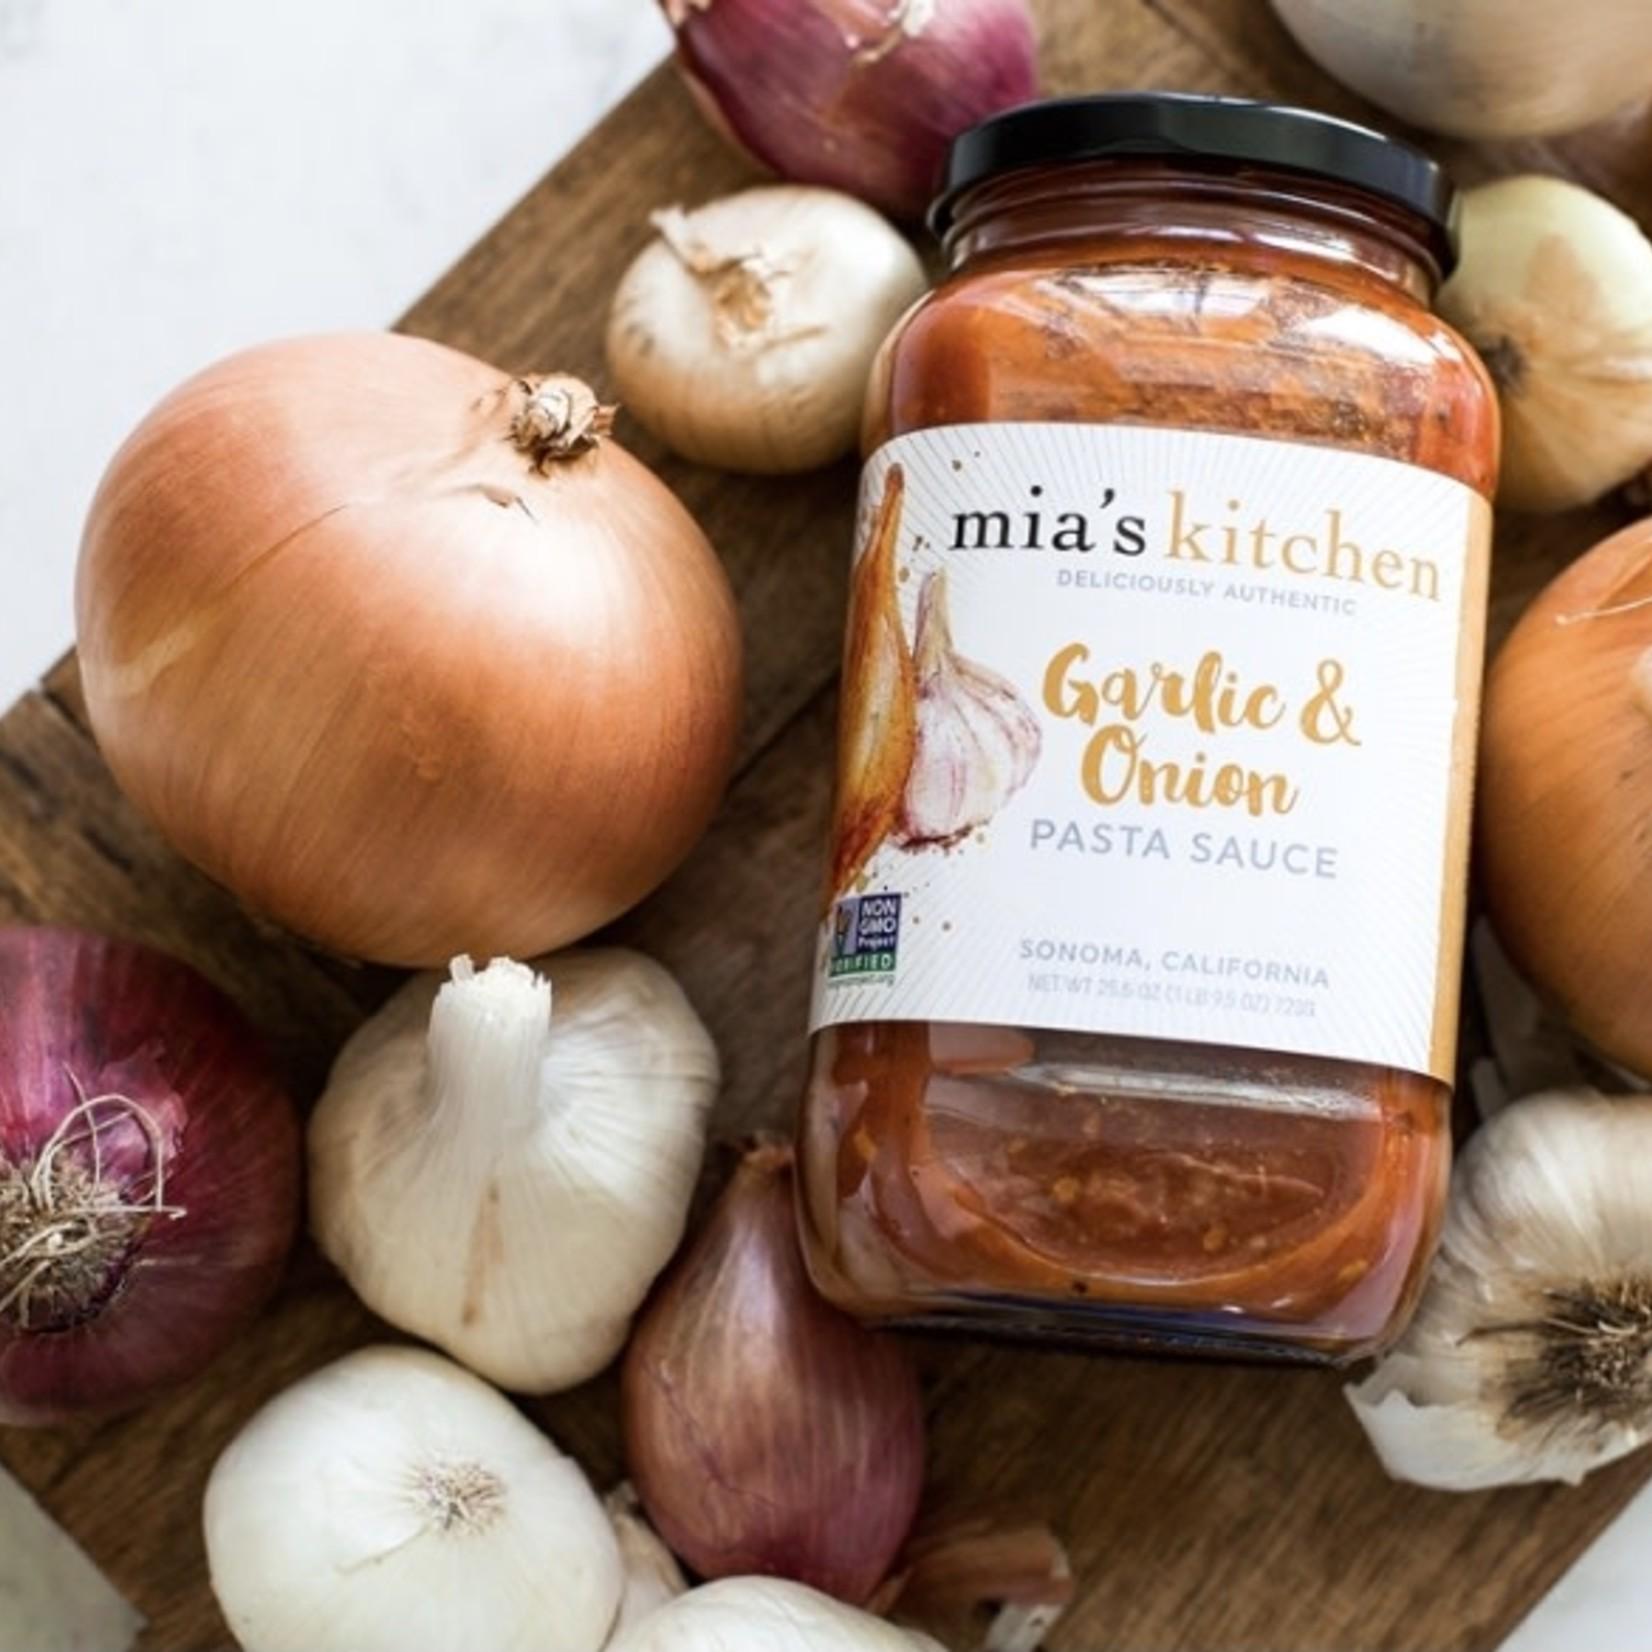 Mia's Kitchen Mia's Kitchen Garlic & Onion Pasta Sauce 710ml